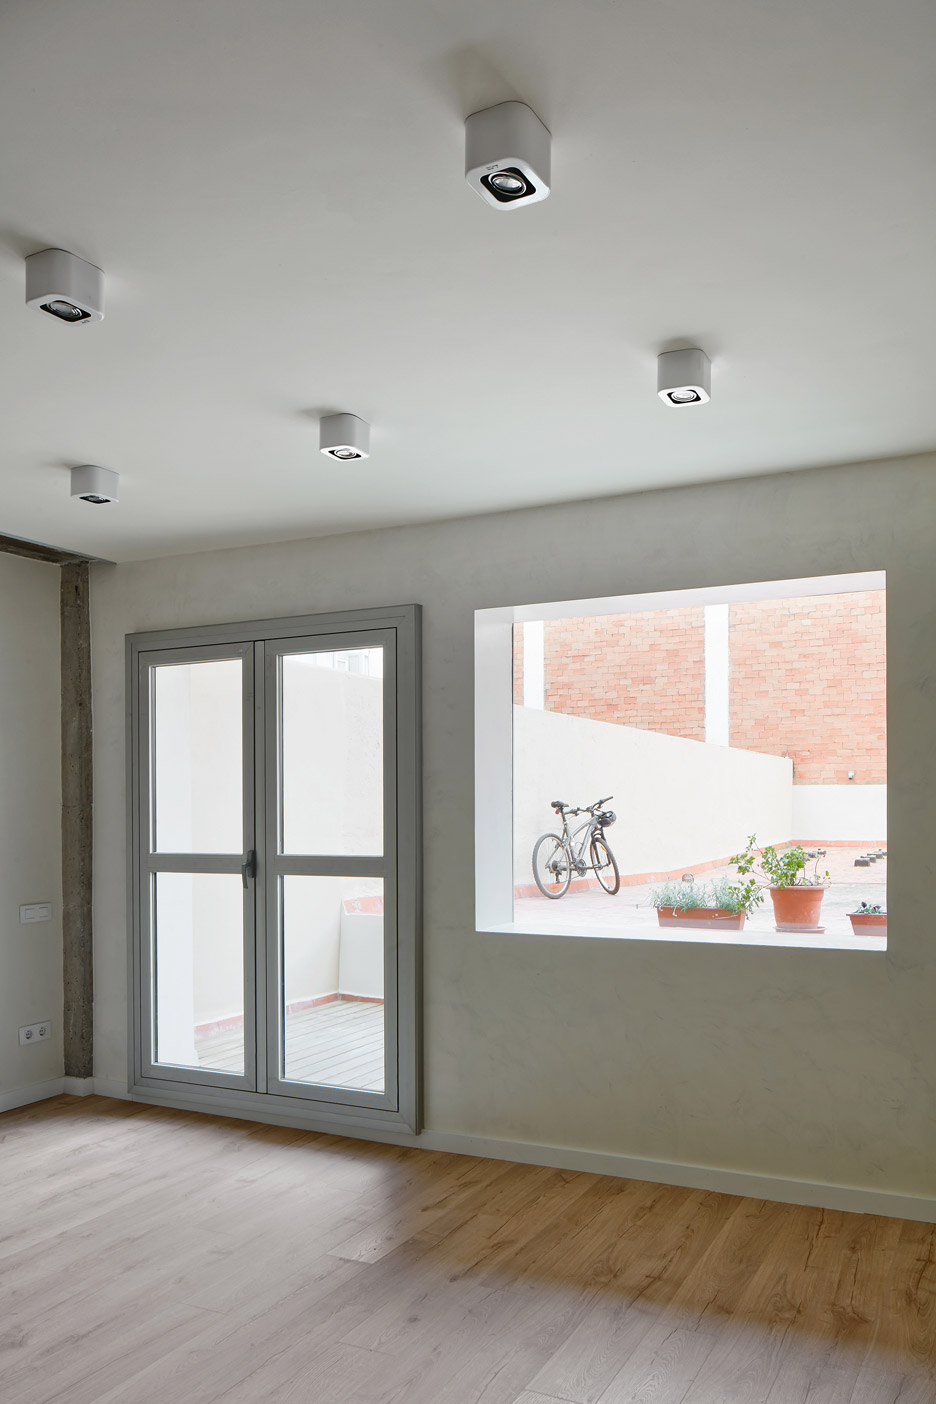 architecture_ open_layout__design_studia_interiors_osnovadesign_osnova_poltava_09